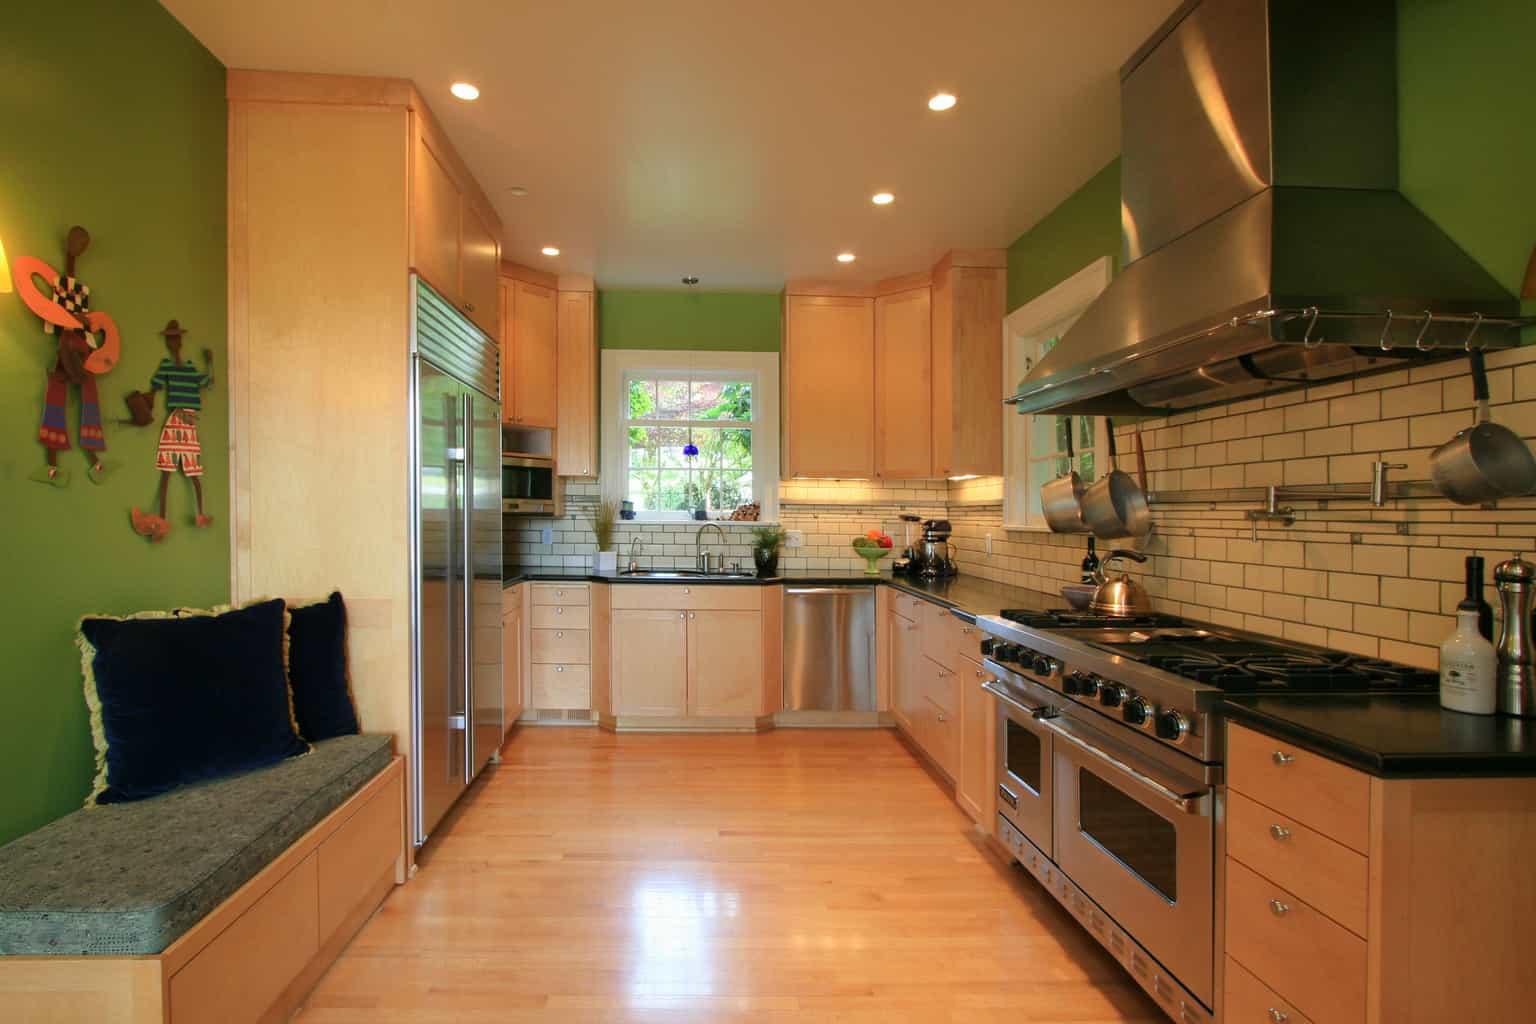 Kitchen And Bathroom Remodeling Contractors Salem Oregon - WU House Kichen